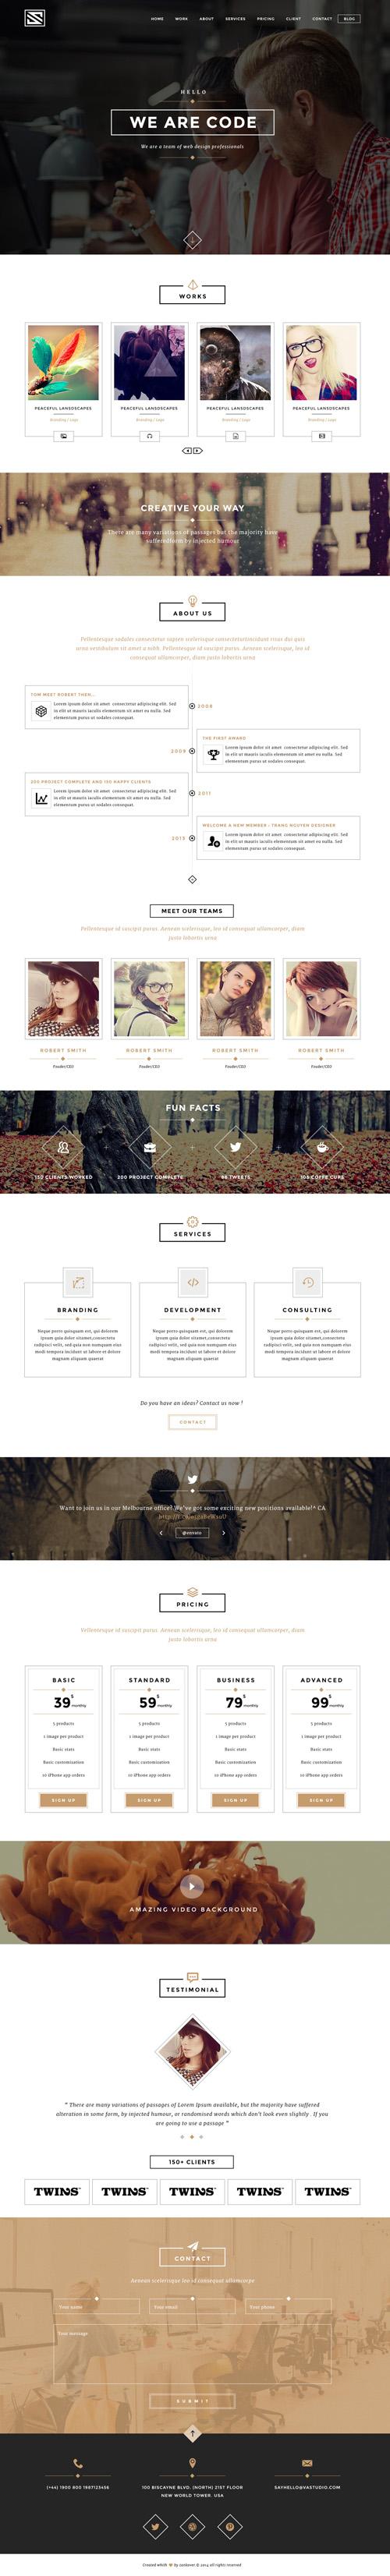 Vastudio - Creative One Page PSD Template